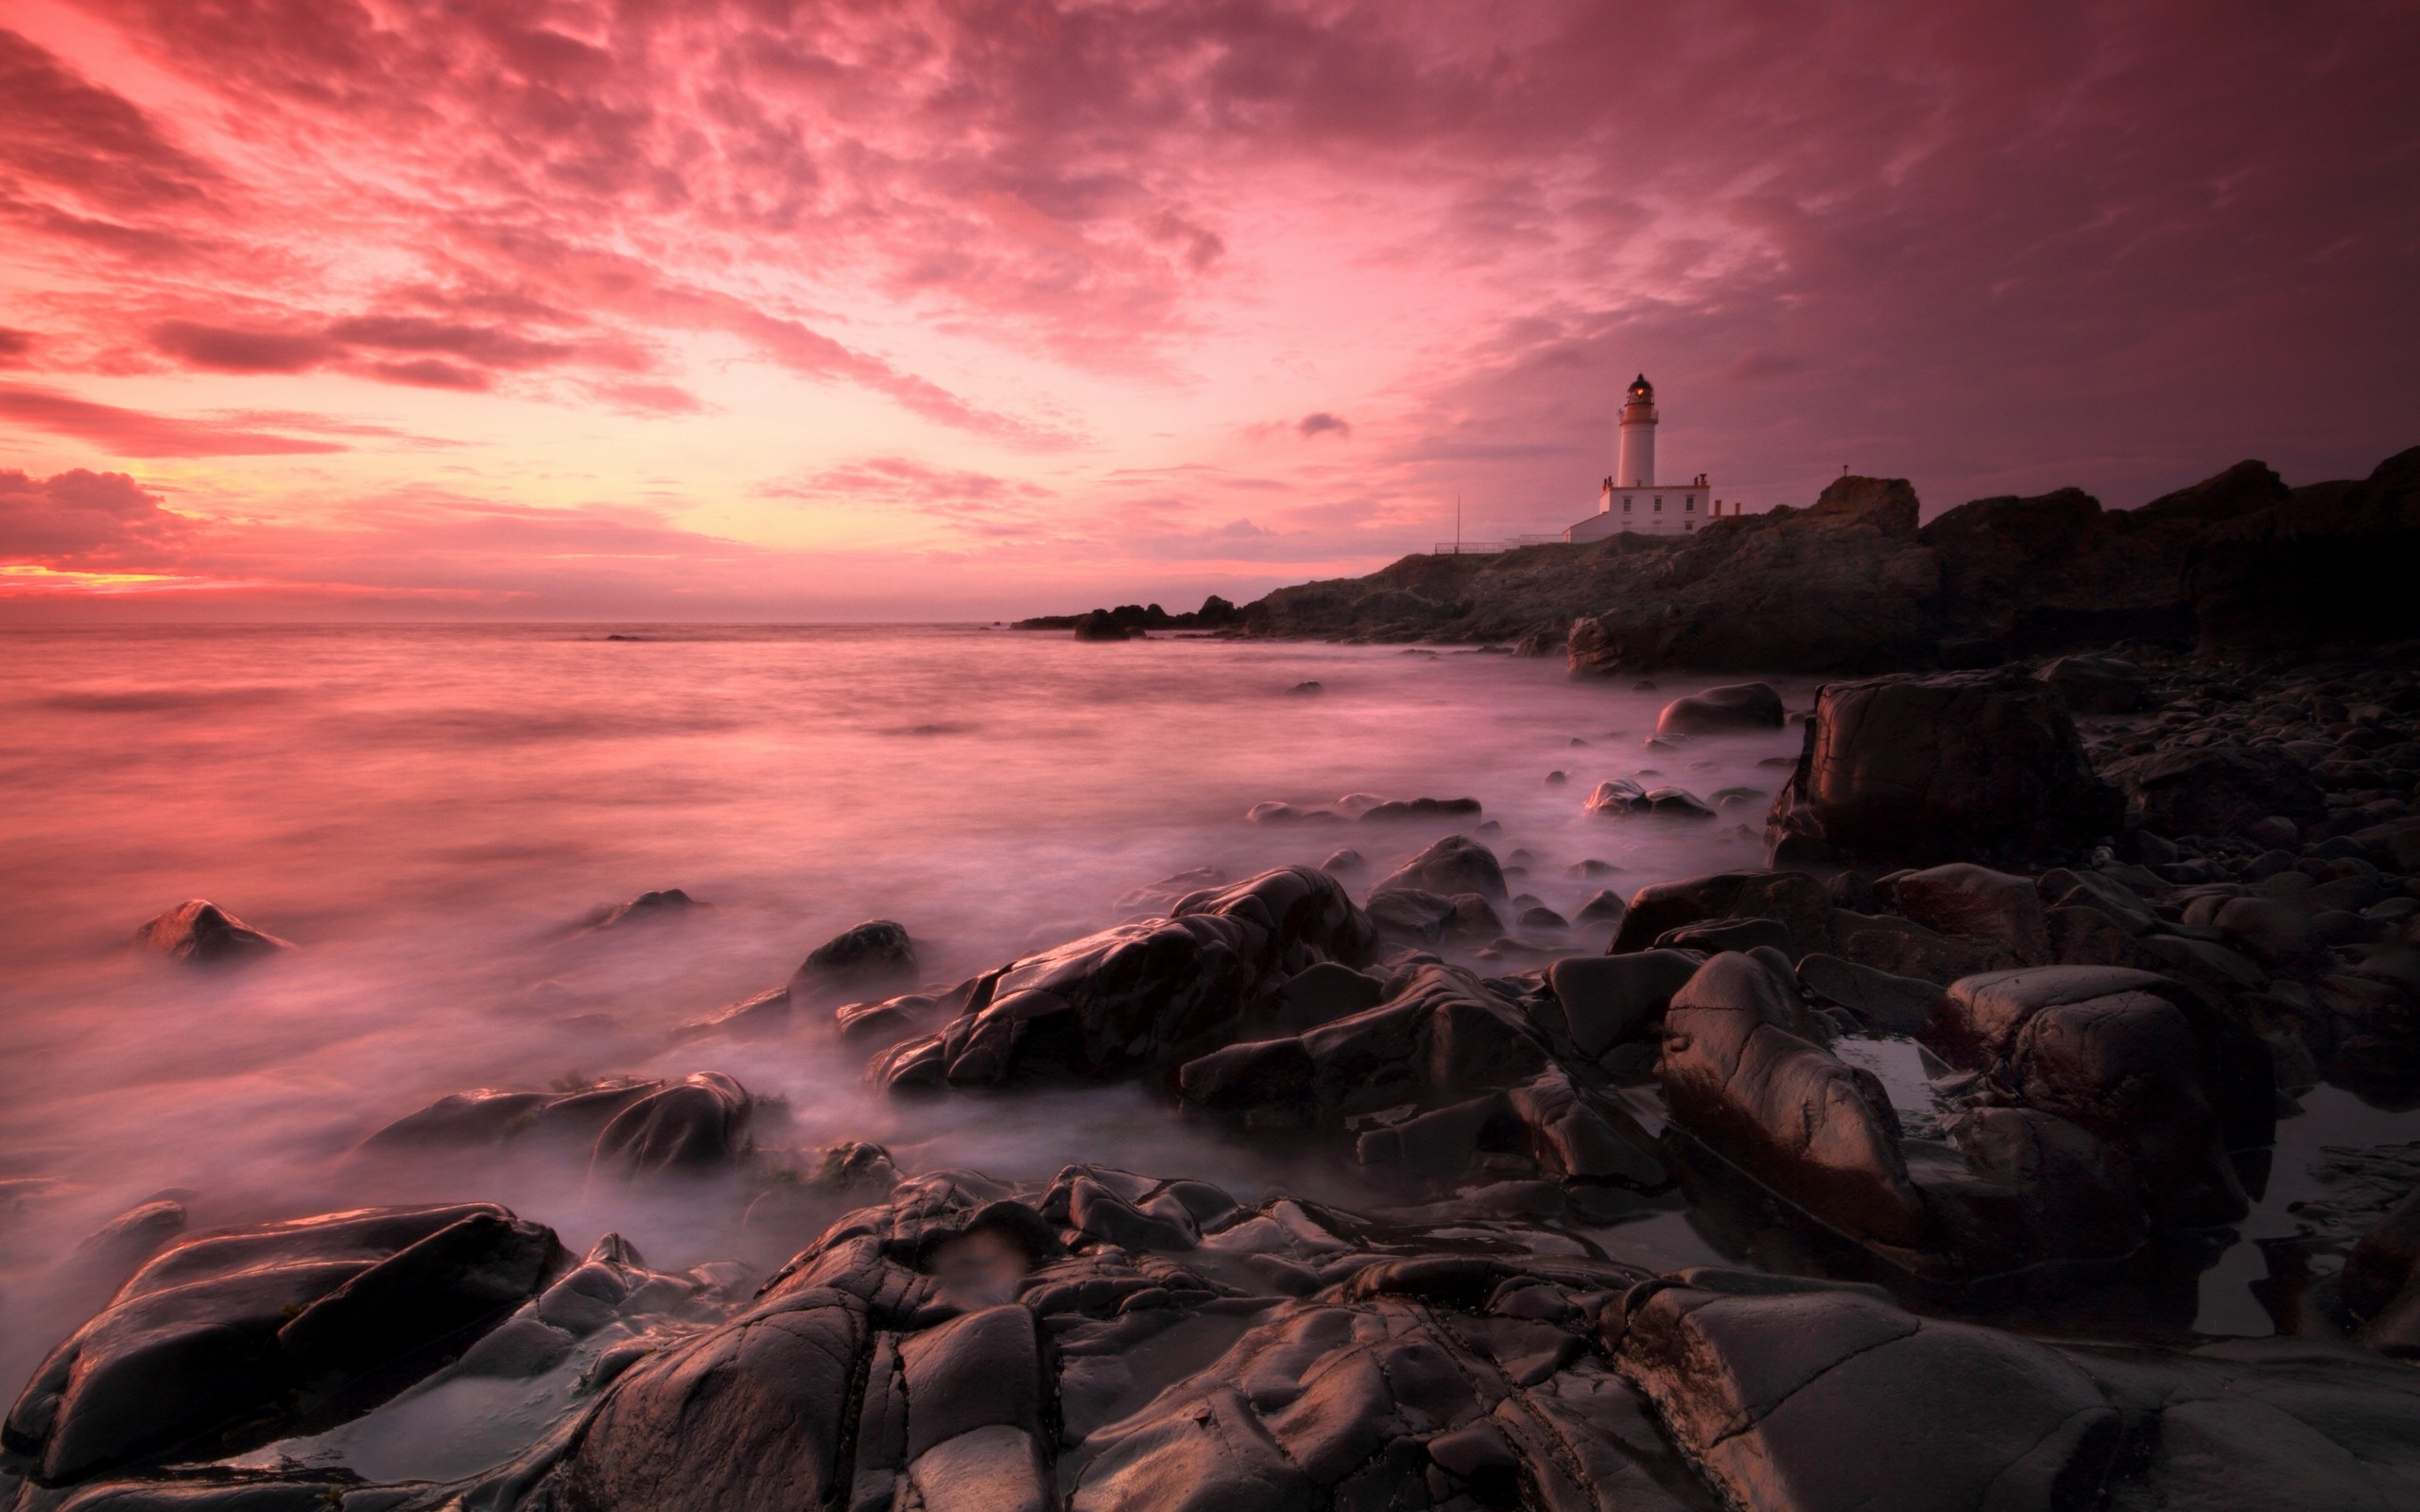 Atardeceres rosados de playas - 2560x1600